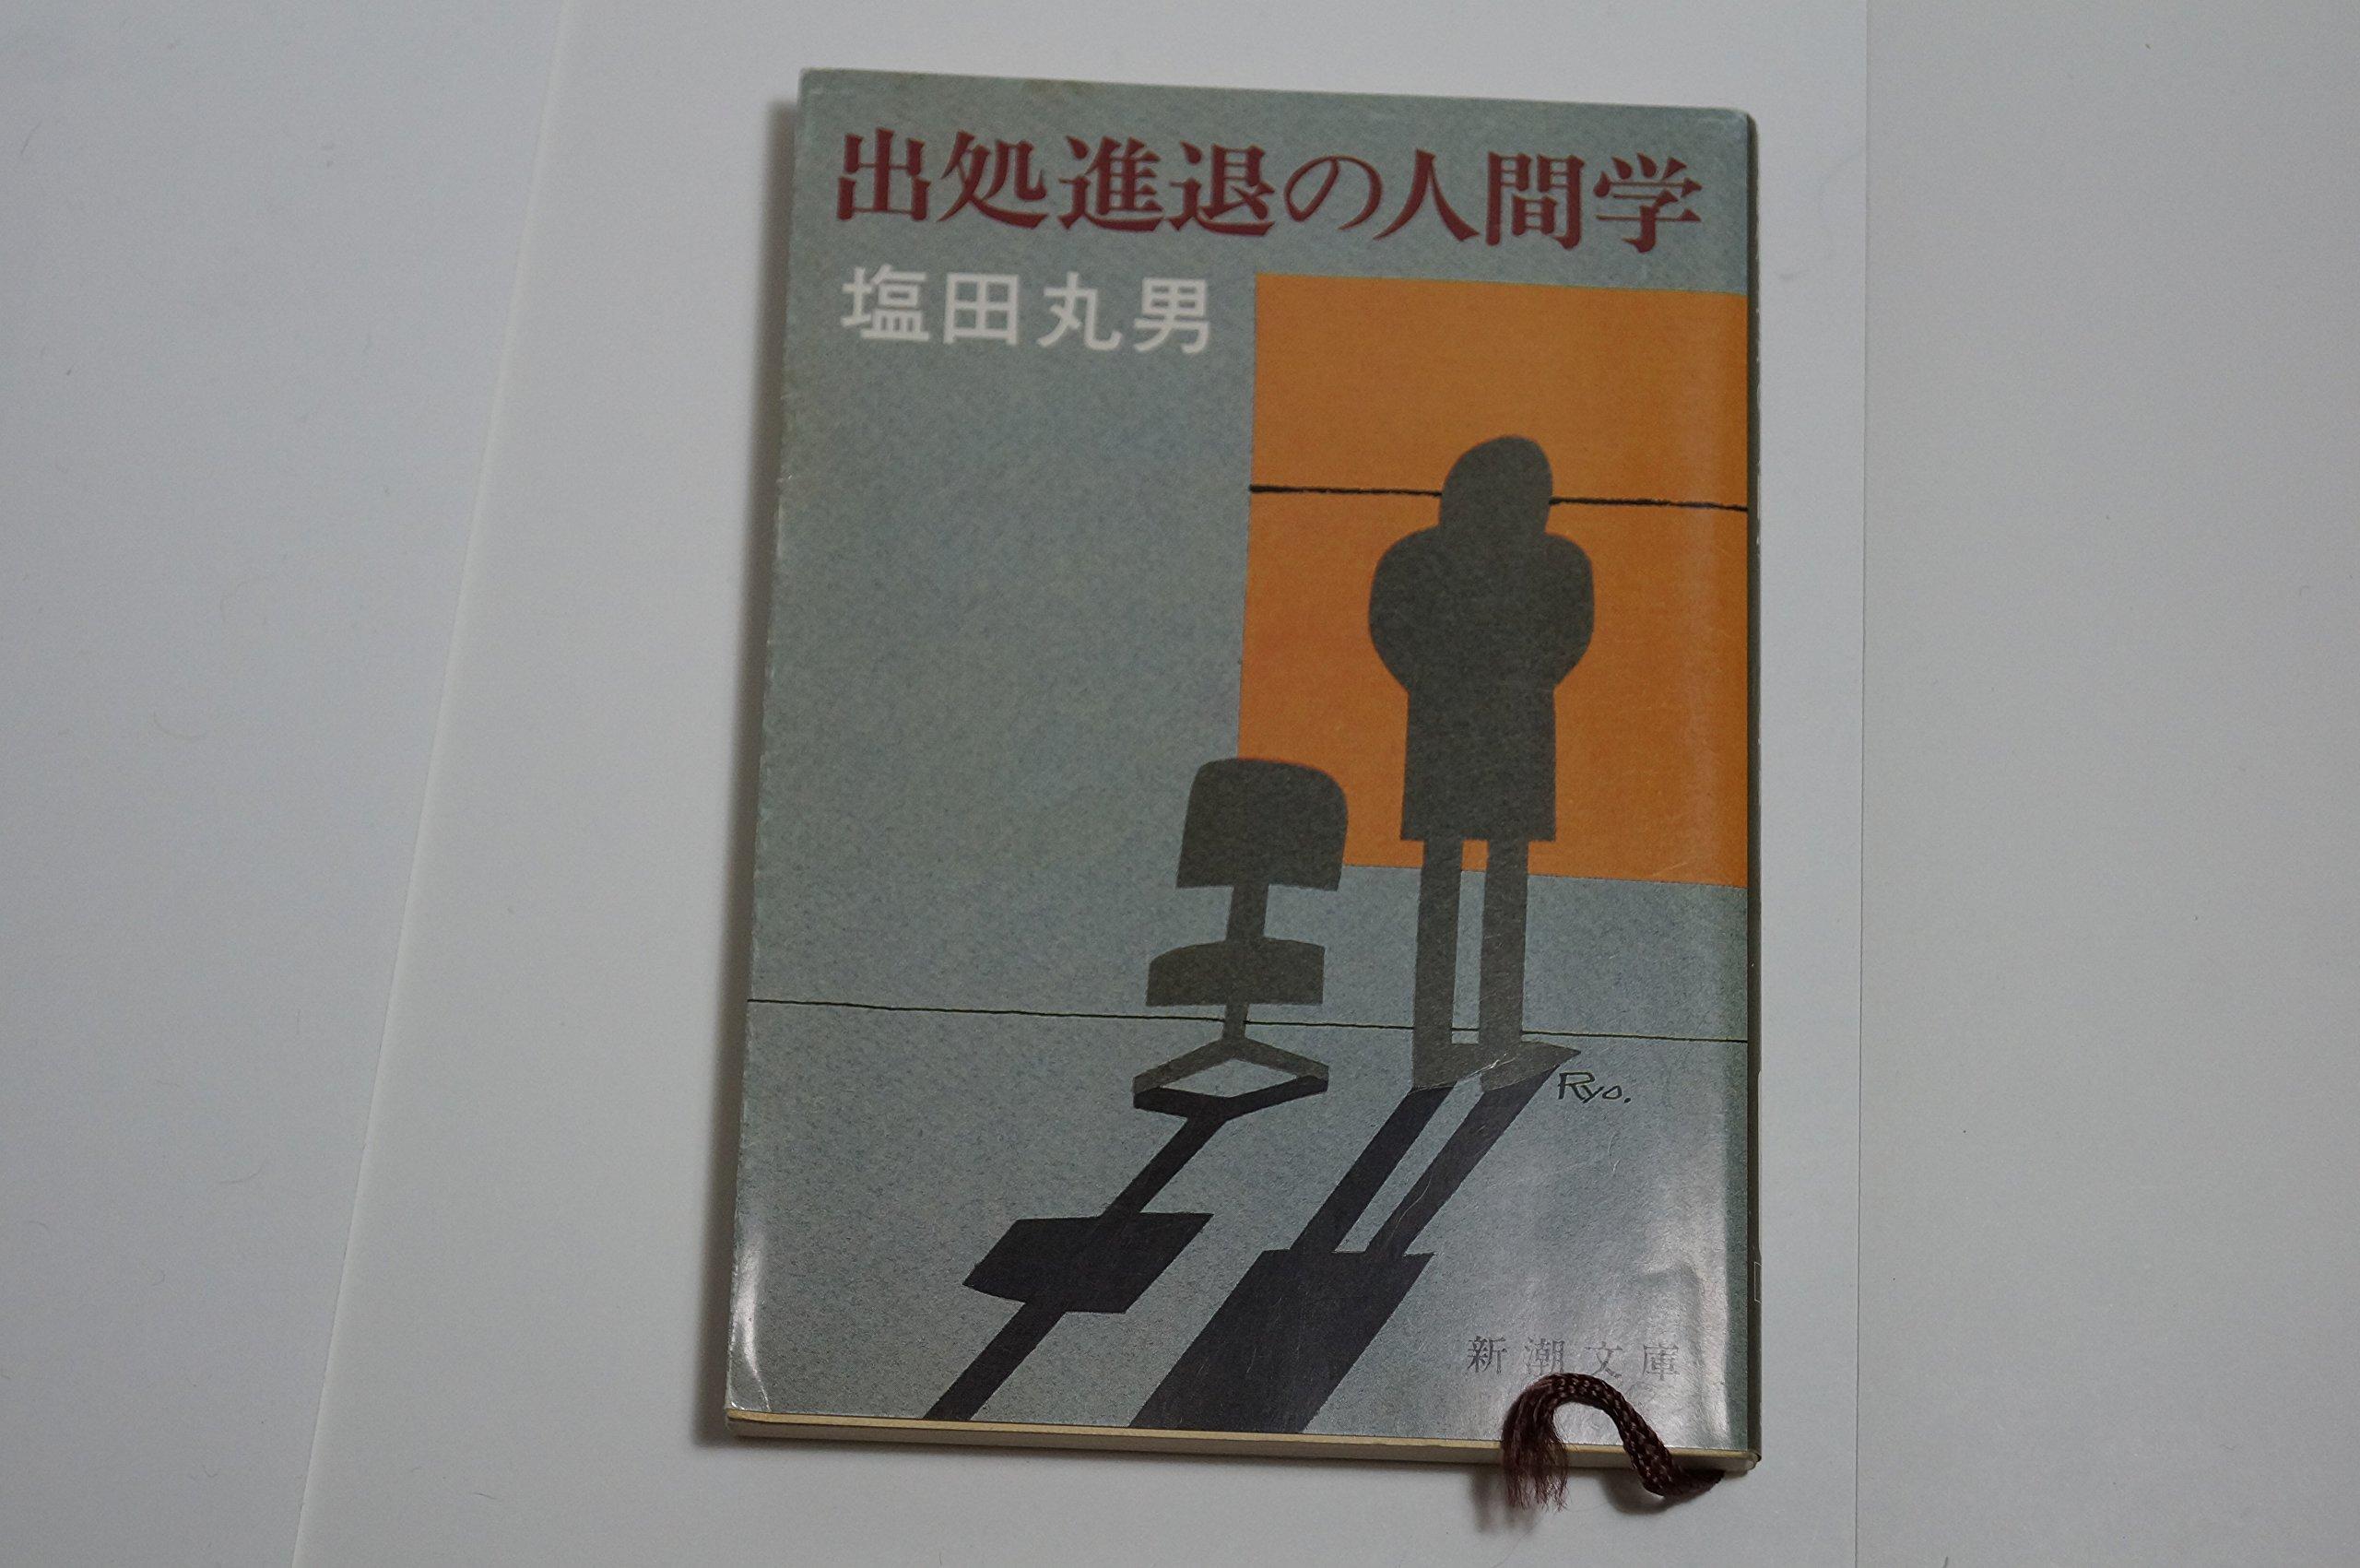 出処進退の人間学 (新潮文庫) | ...